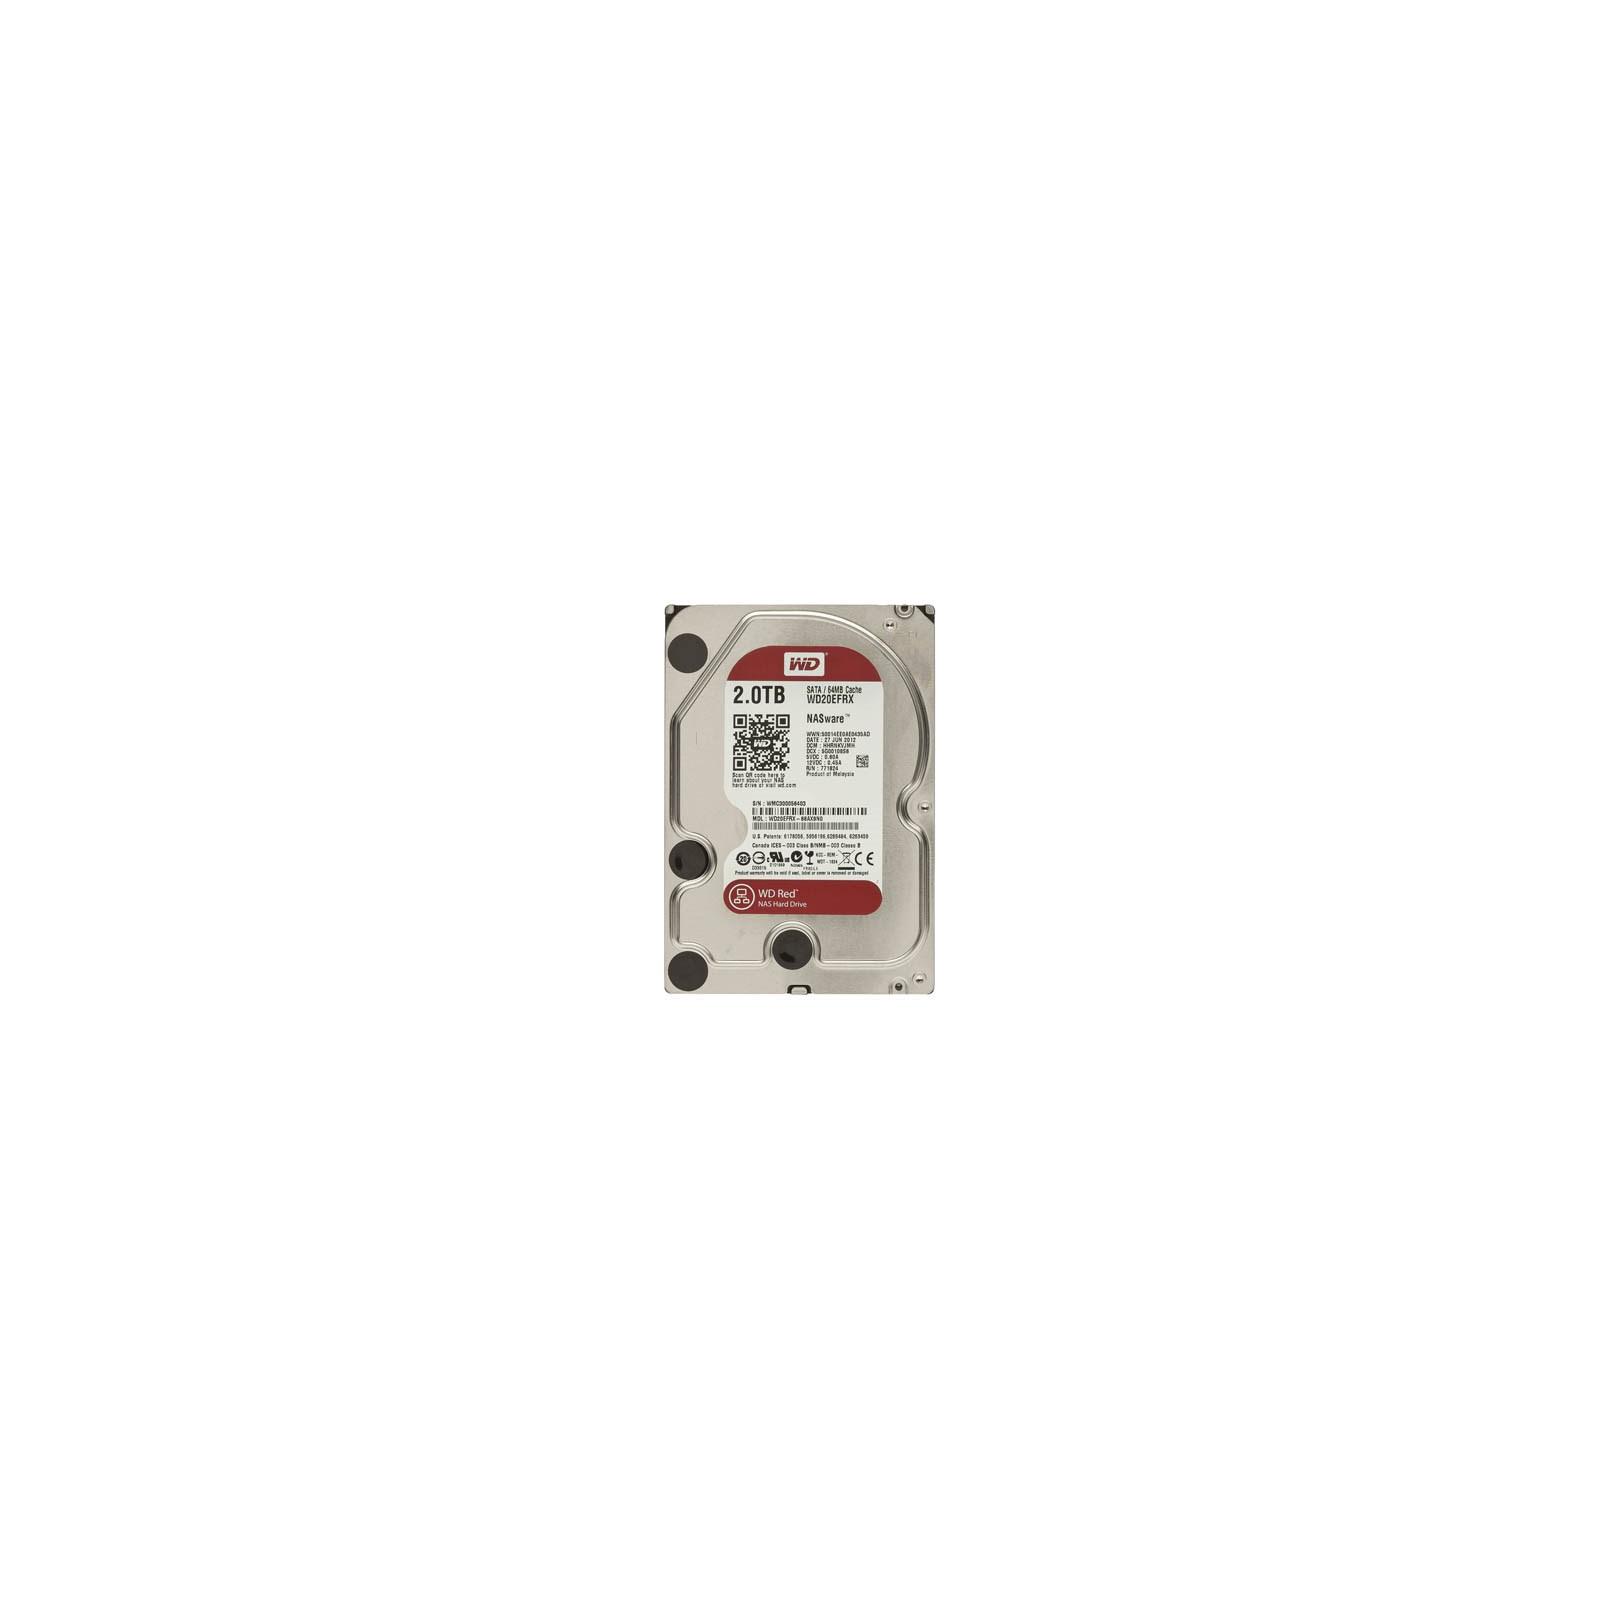 "Жесткий диск 3.5"" 2TB Western Digital (WD20EFRX)"